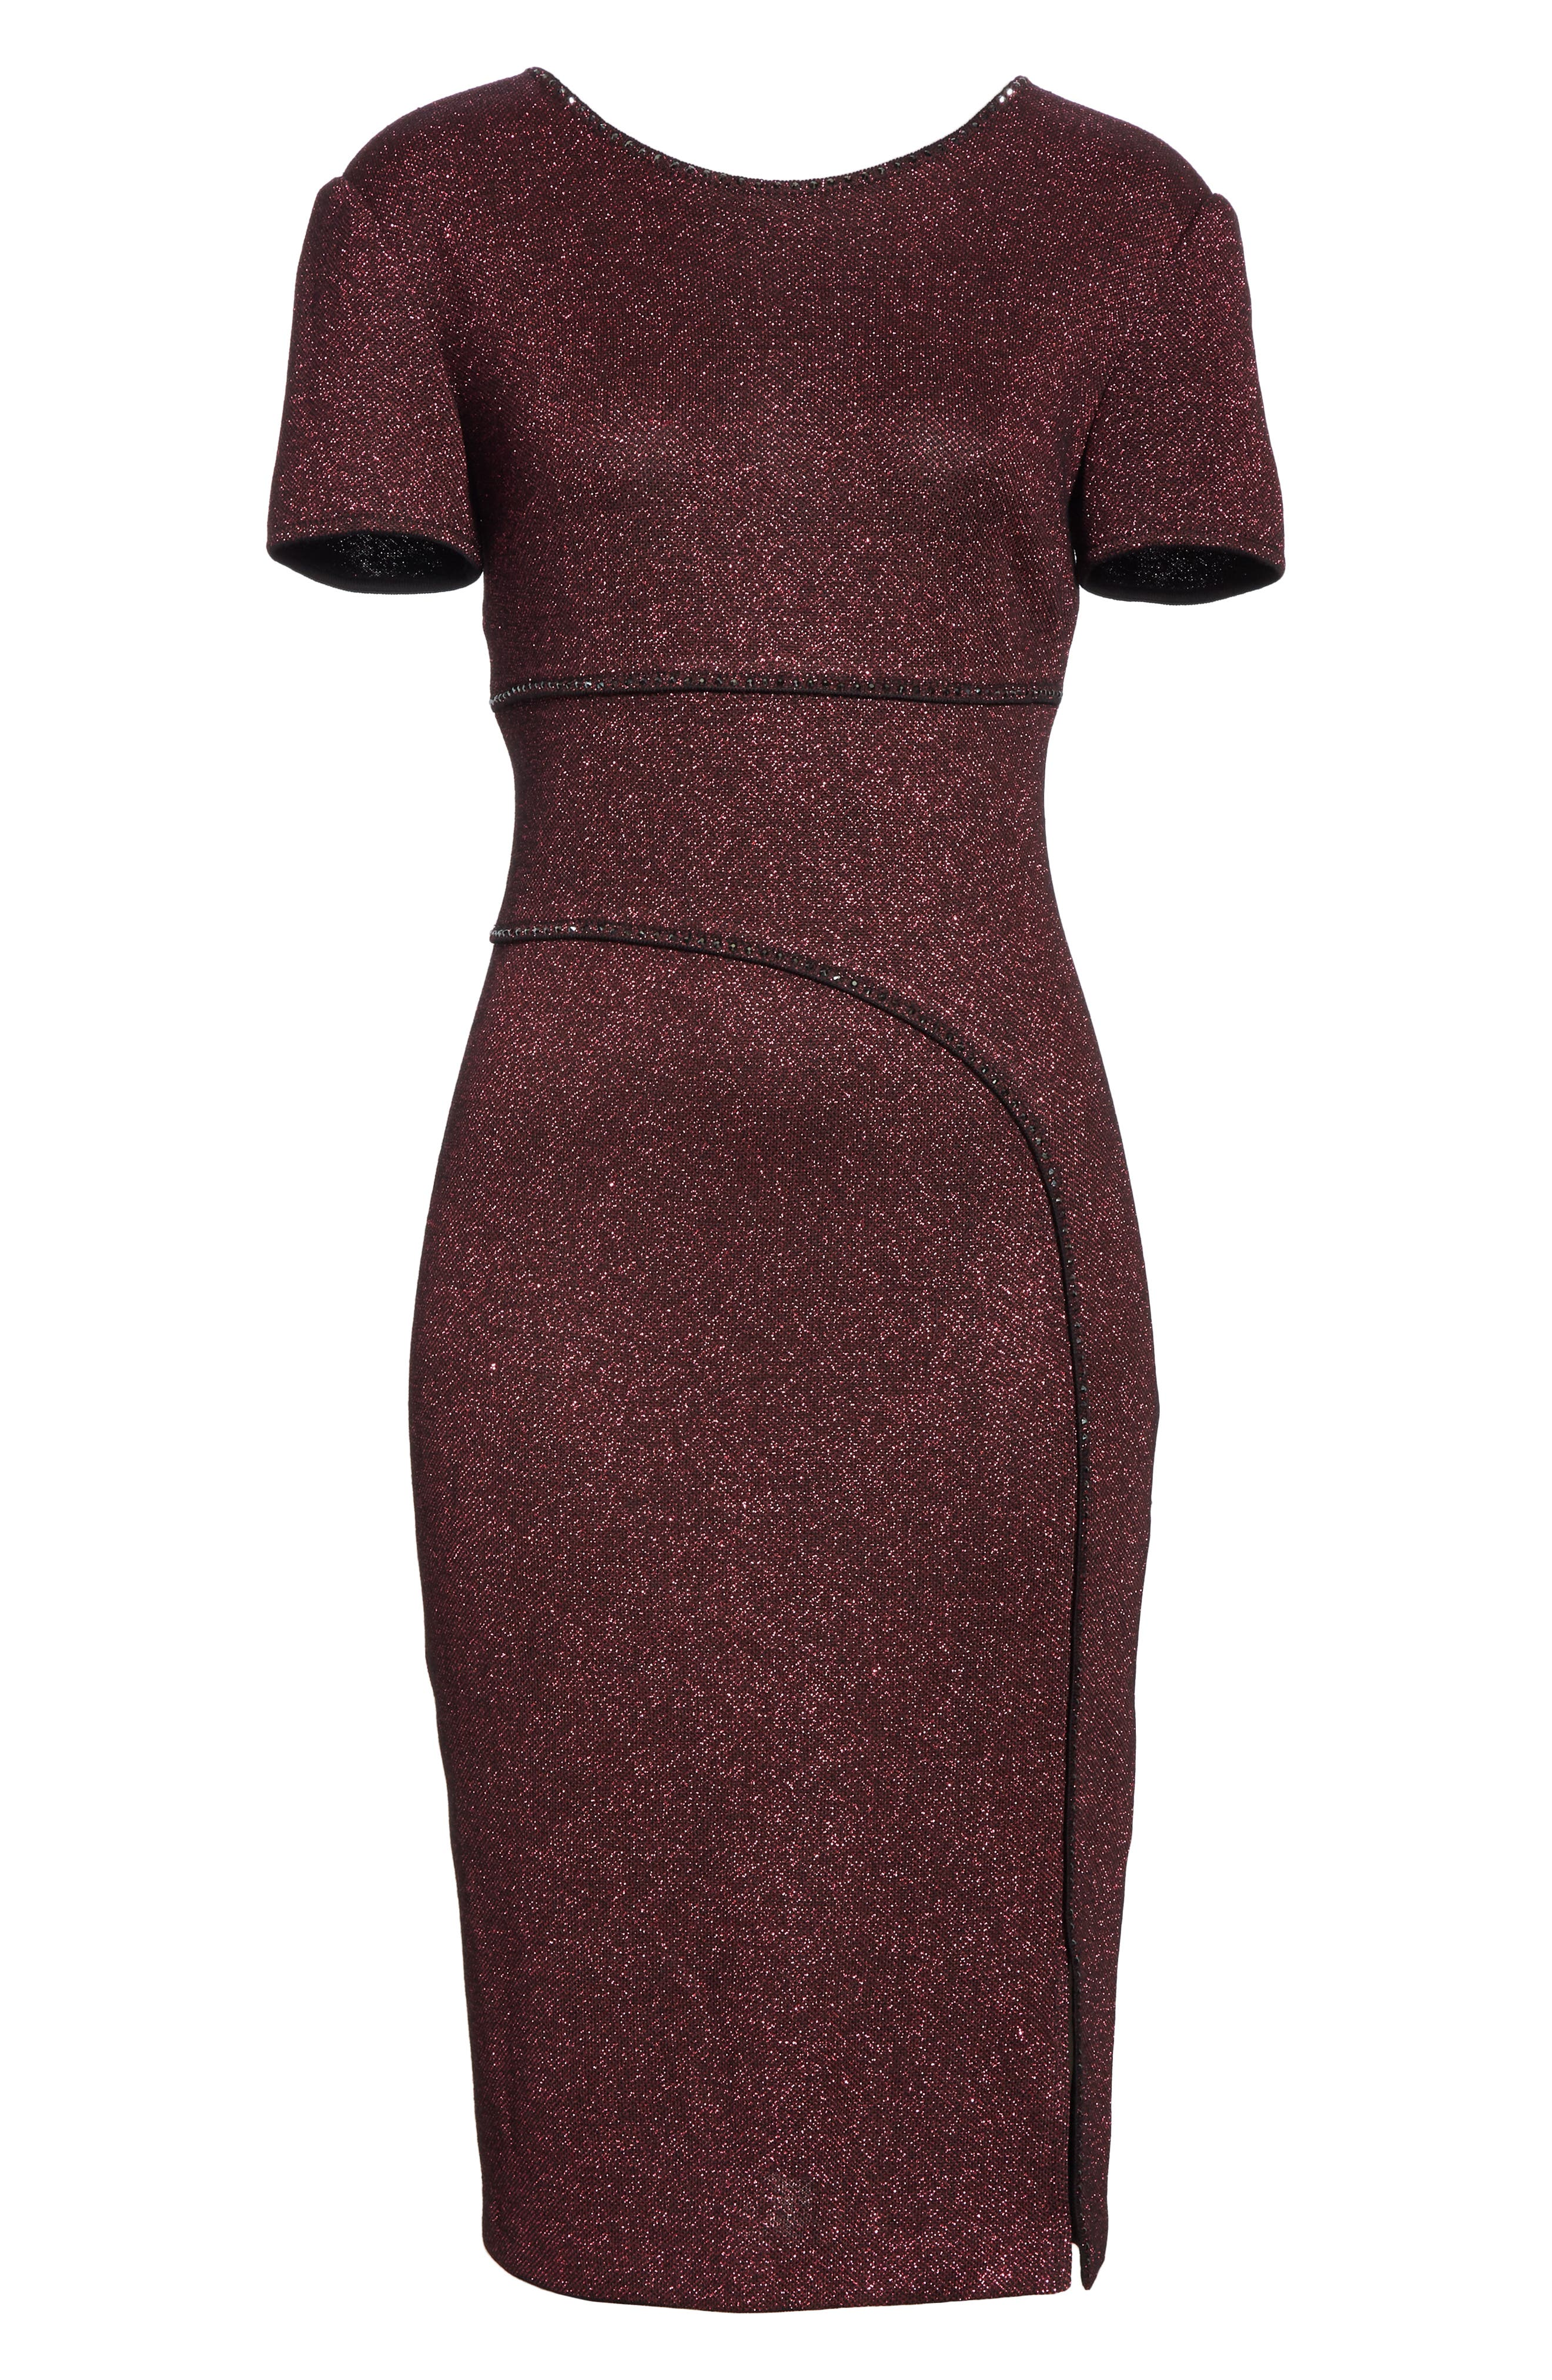 Mod Metallic Knit Sheath Dress,                             Alternate thumbnail 7, color,                             DARK PINK MULTI